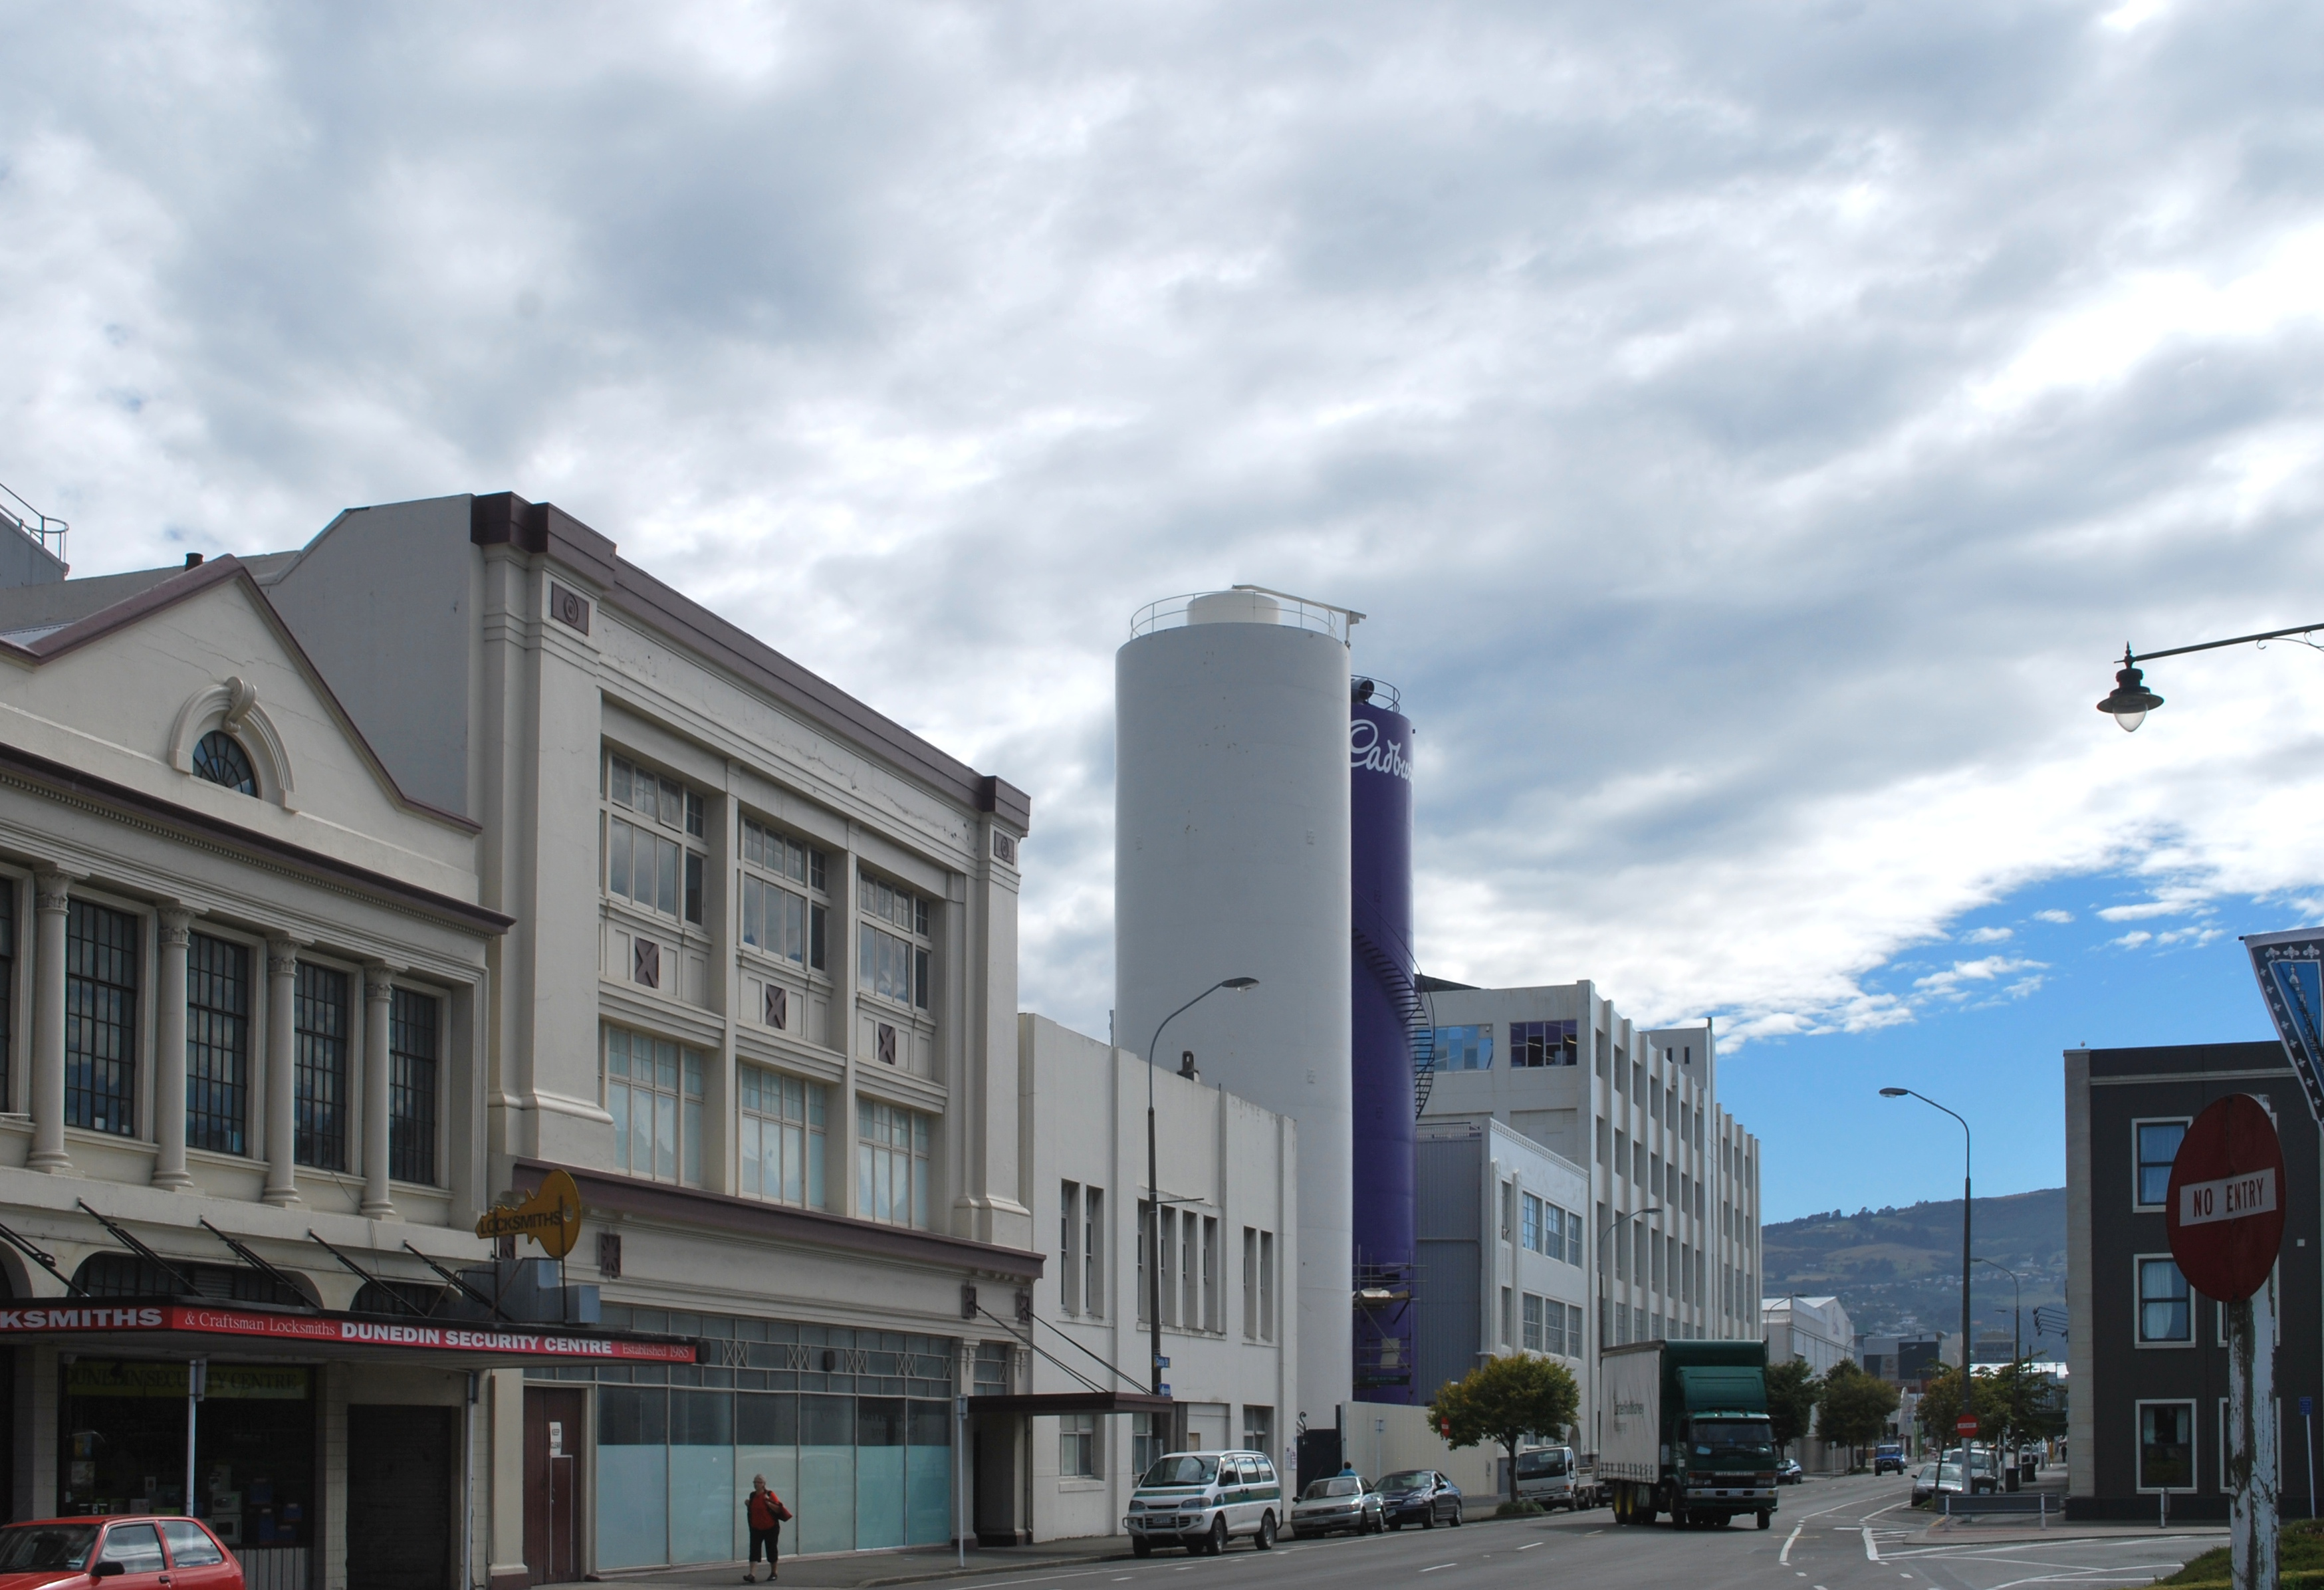 File:Dunedin Cadbury Building.JPG - Wikimedia Commons